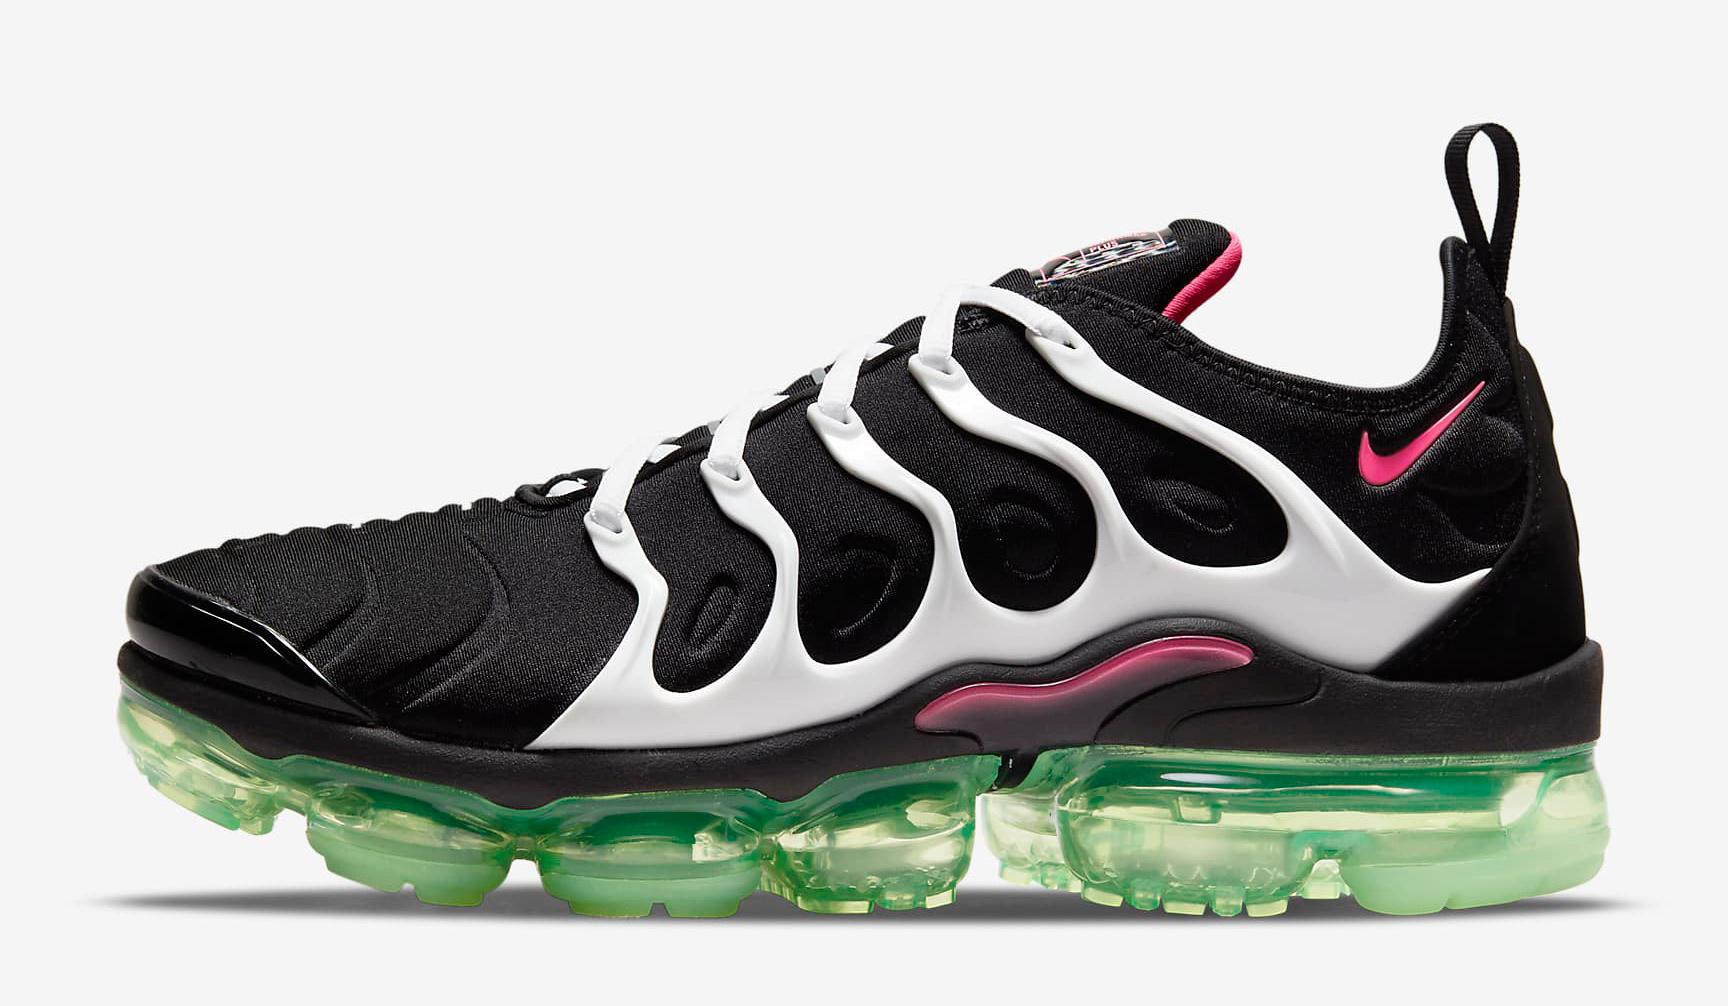 nike-air-vapormax-plus-do-you-black-lime-glow-hyper-pink-2